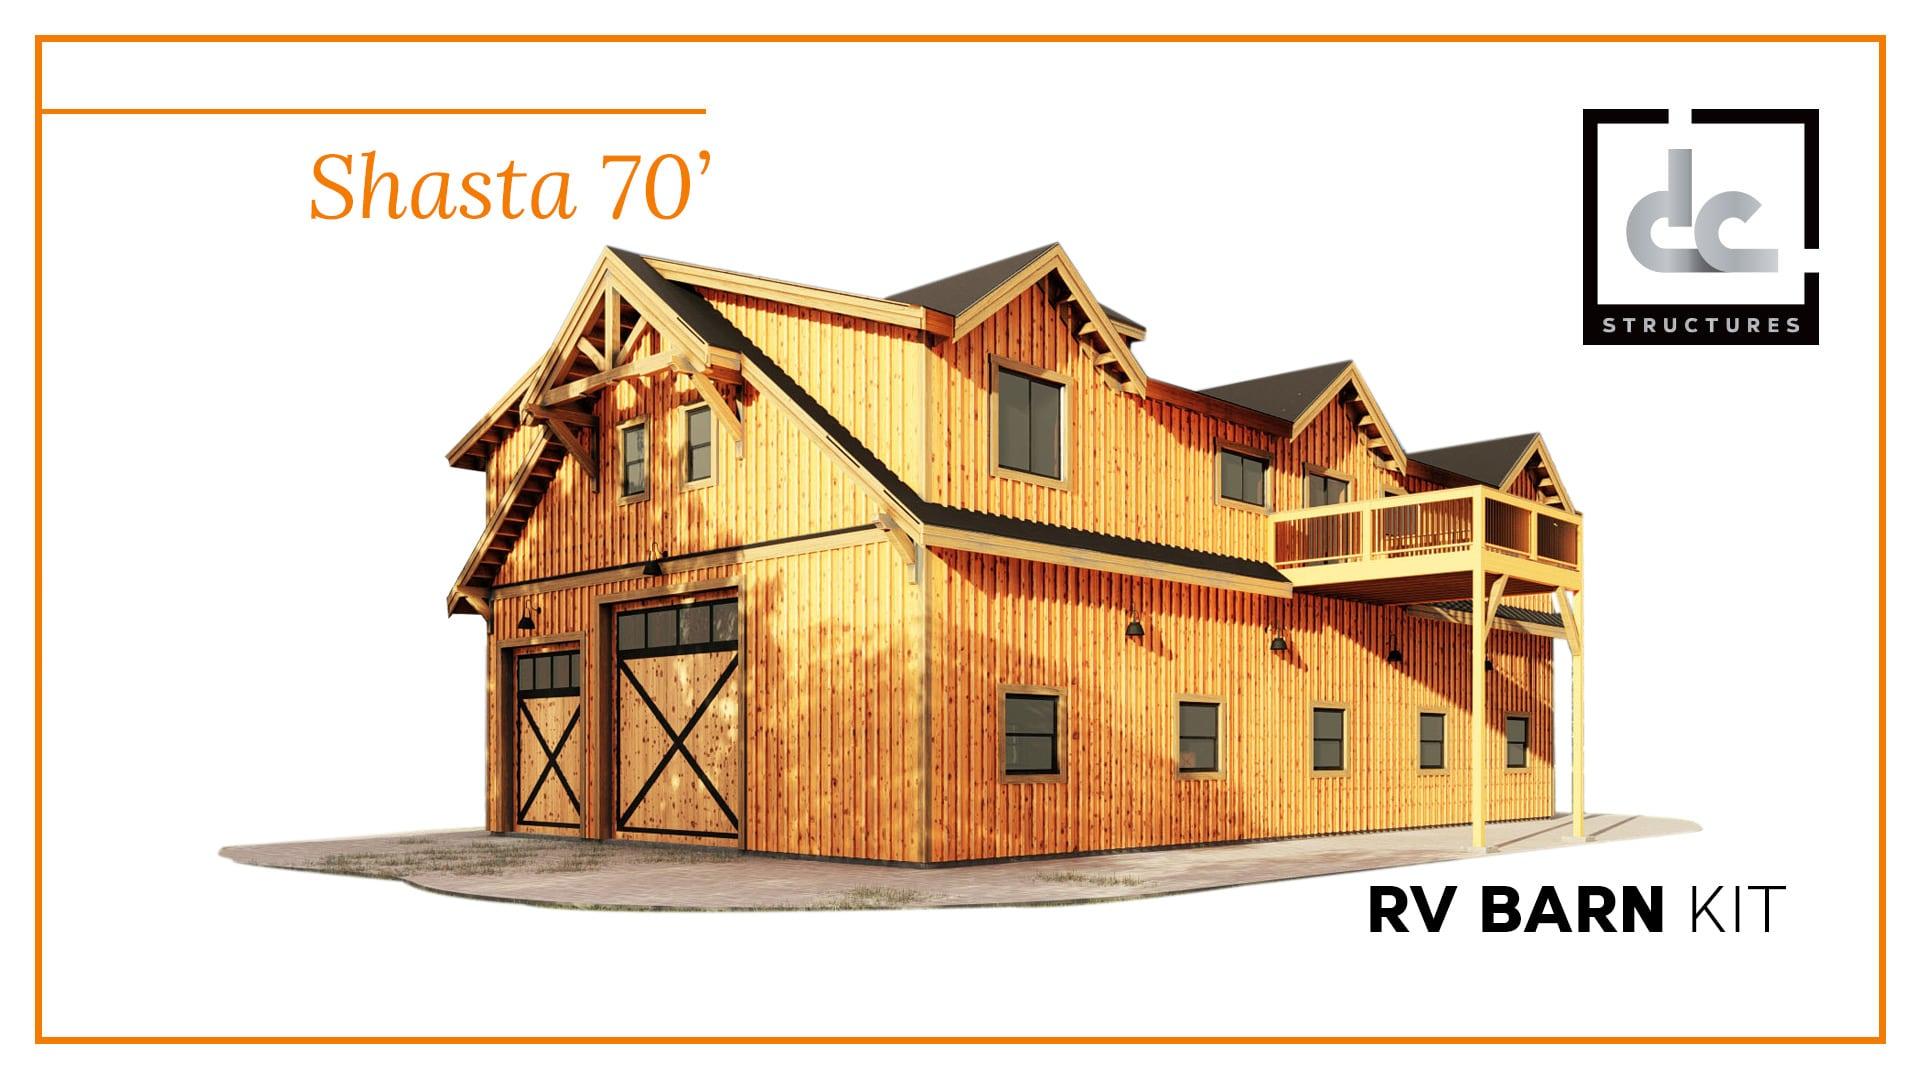 Shasta Rv Barn Kit 70 Garage With Living Quarters Kit